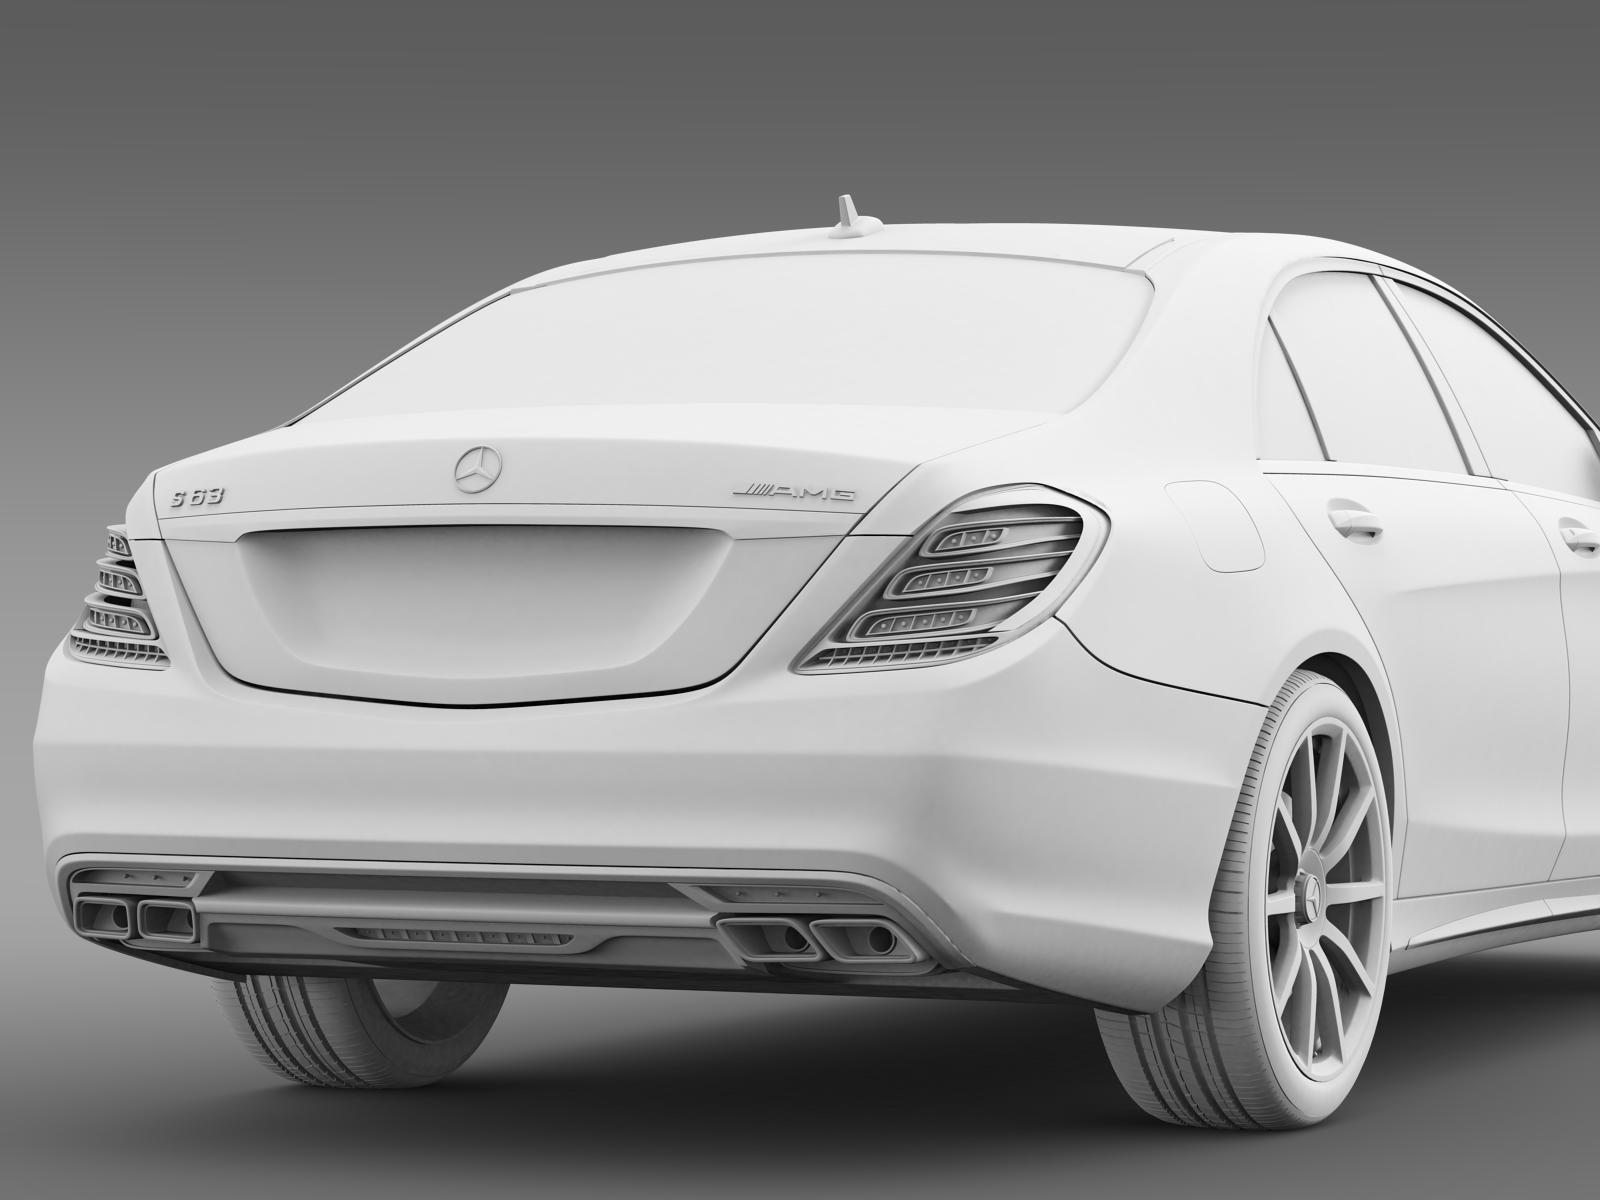 Mercedes benz s 63 amg w222 2013 3d model for Different models of mercedes benz